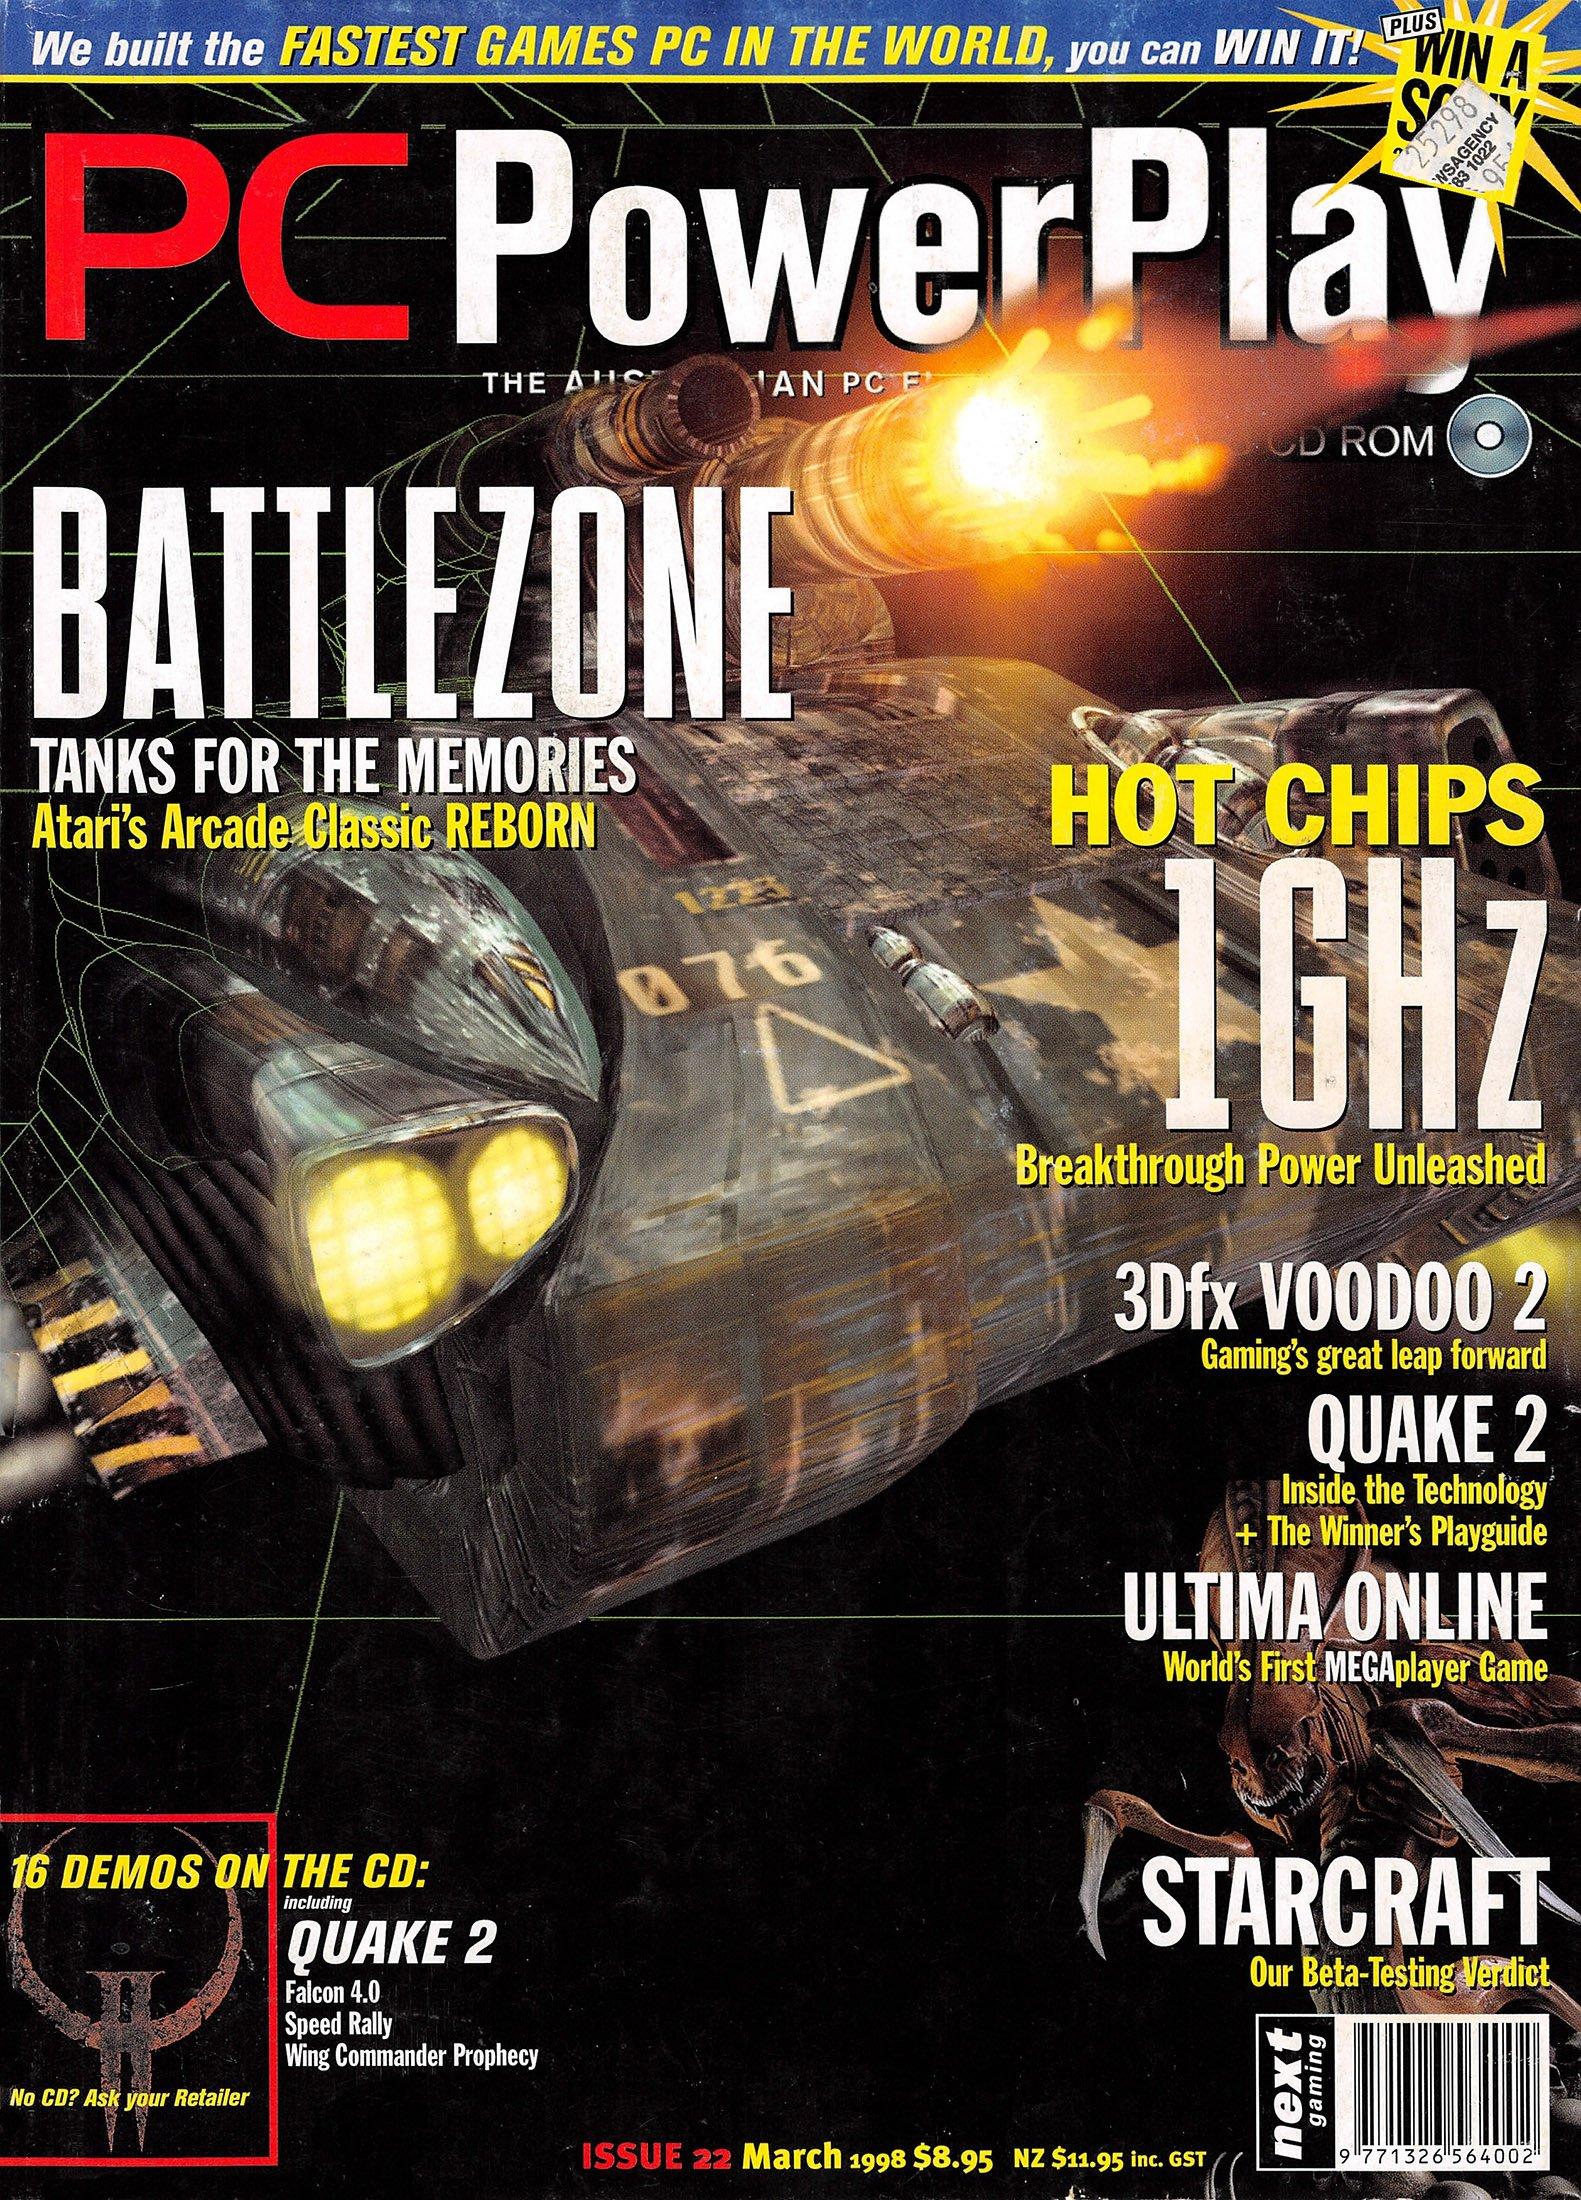 PC PowerPlay 022 (March 1998)